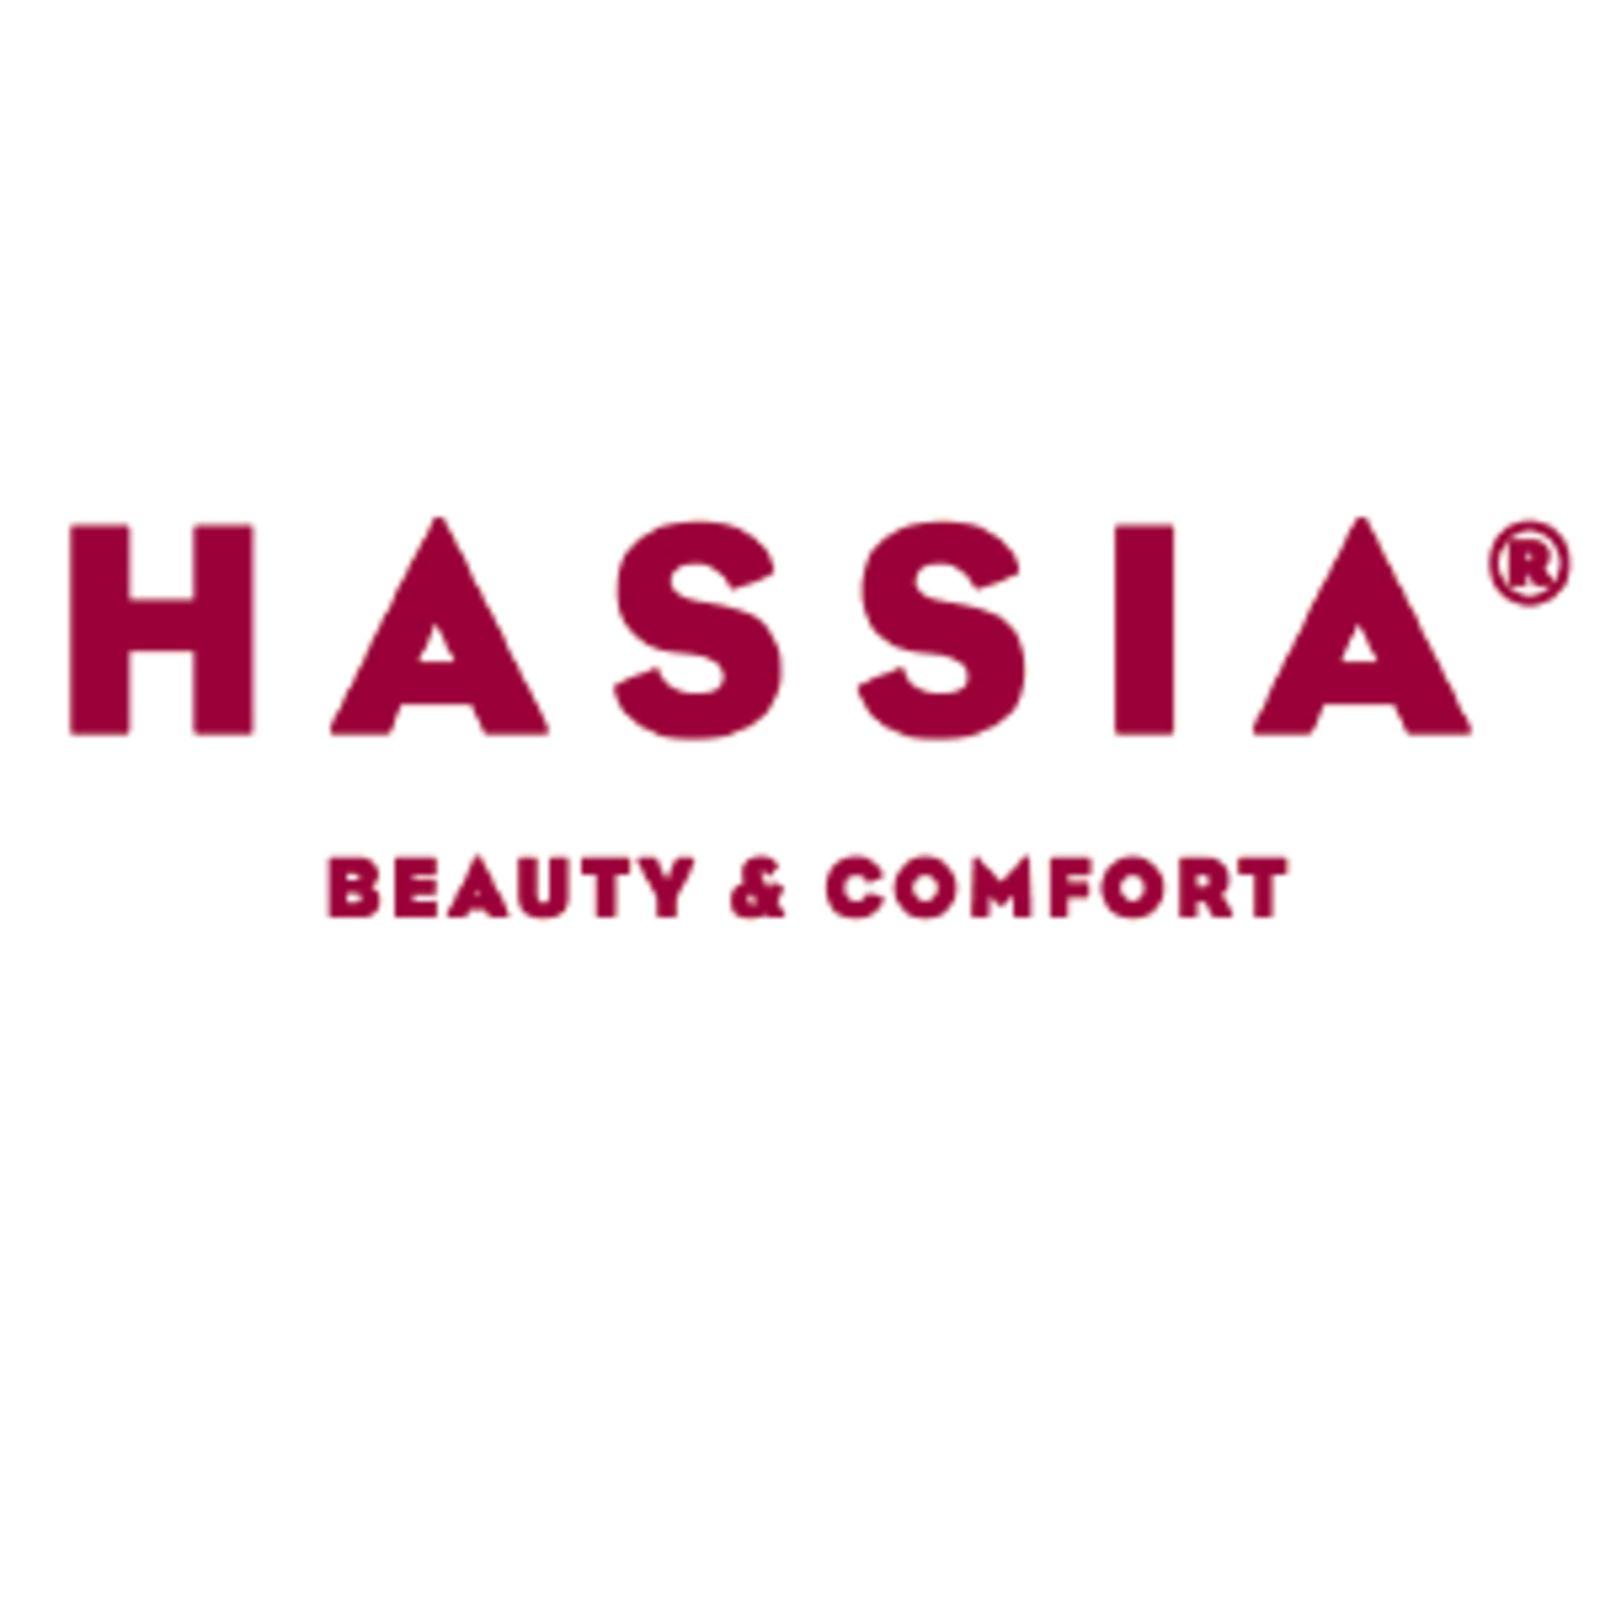 HASSIA